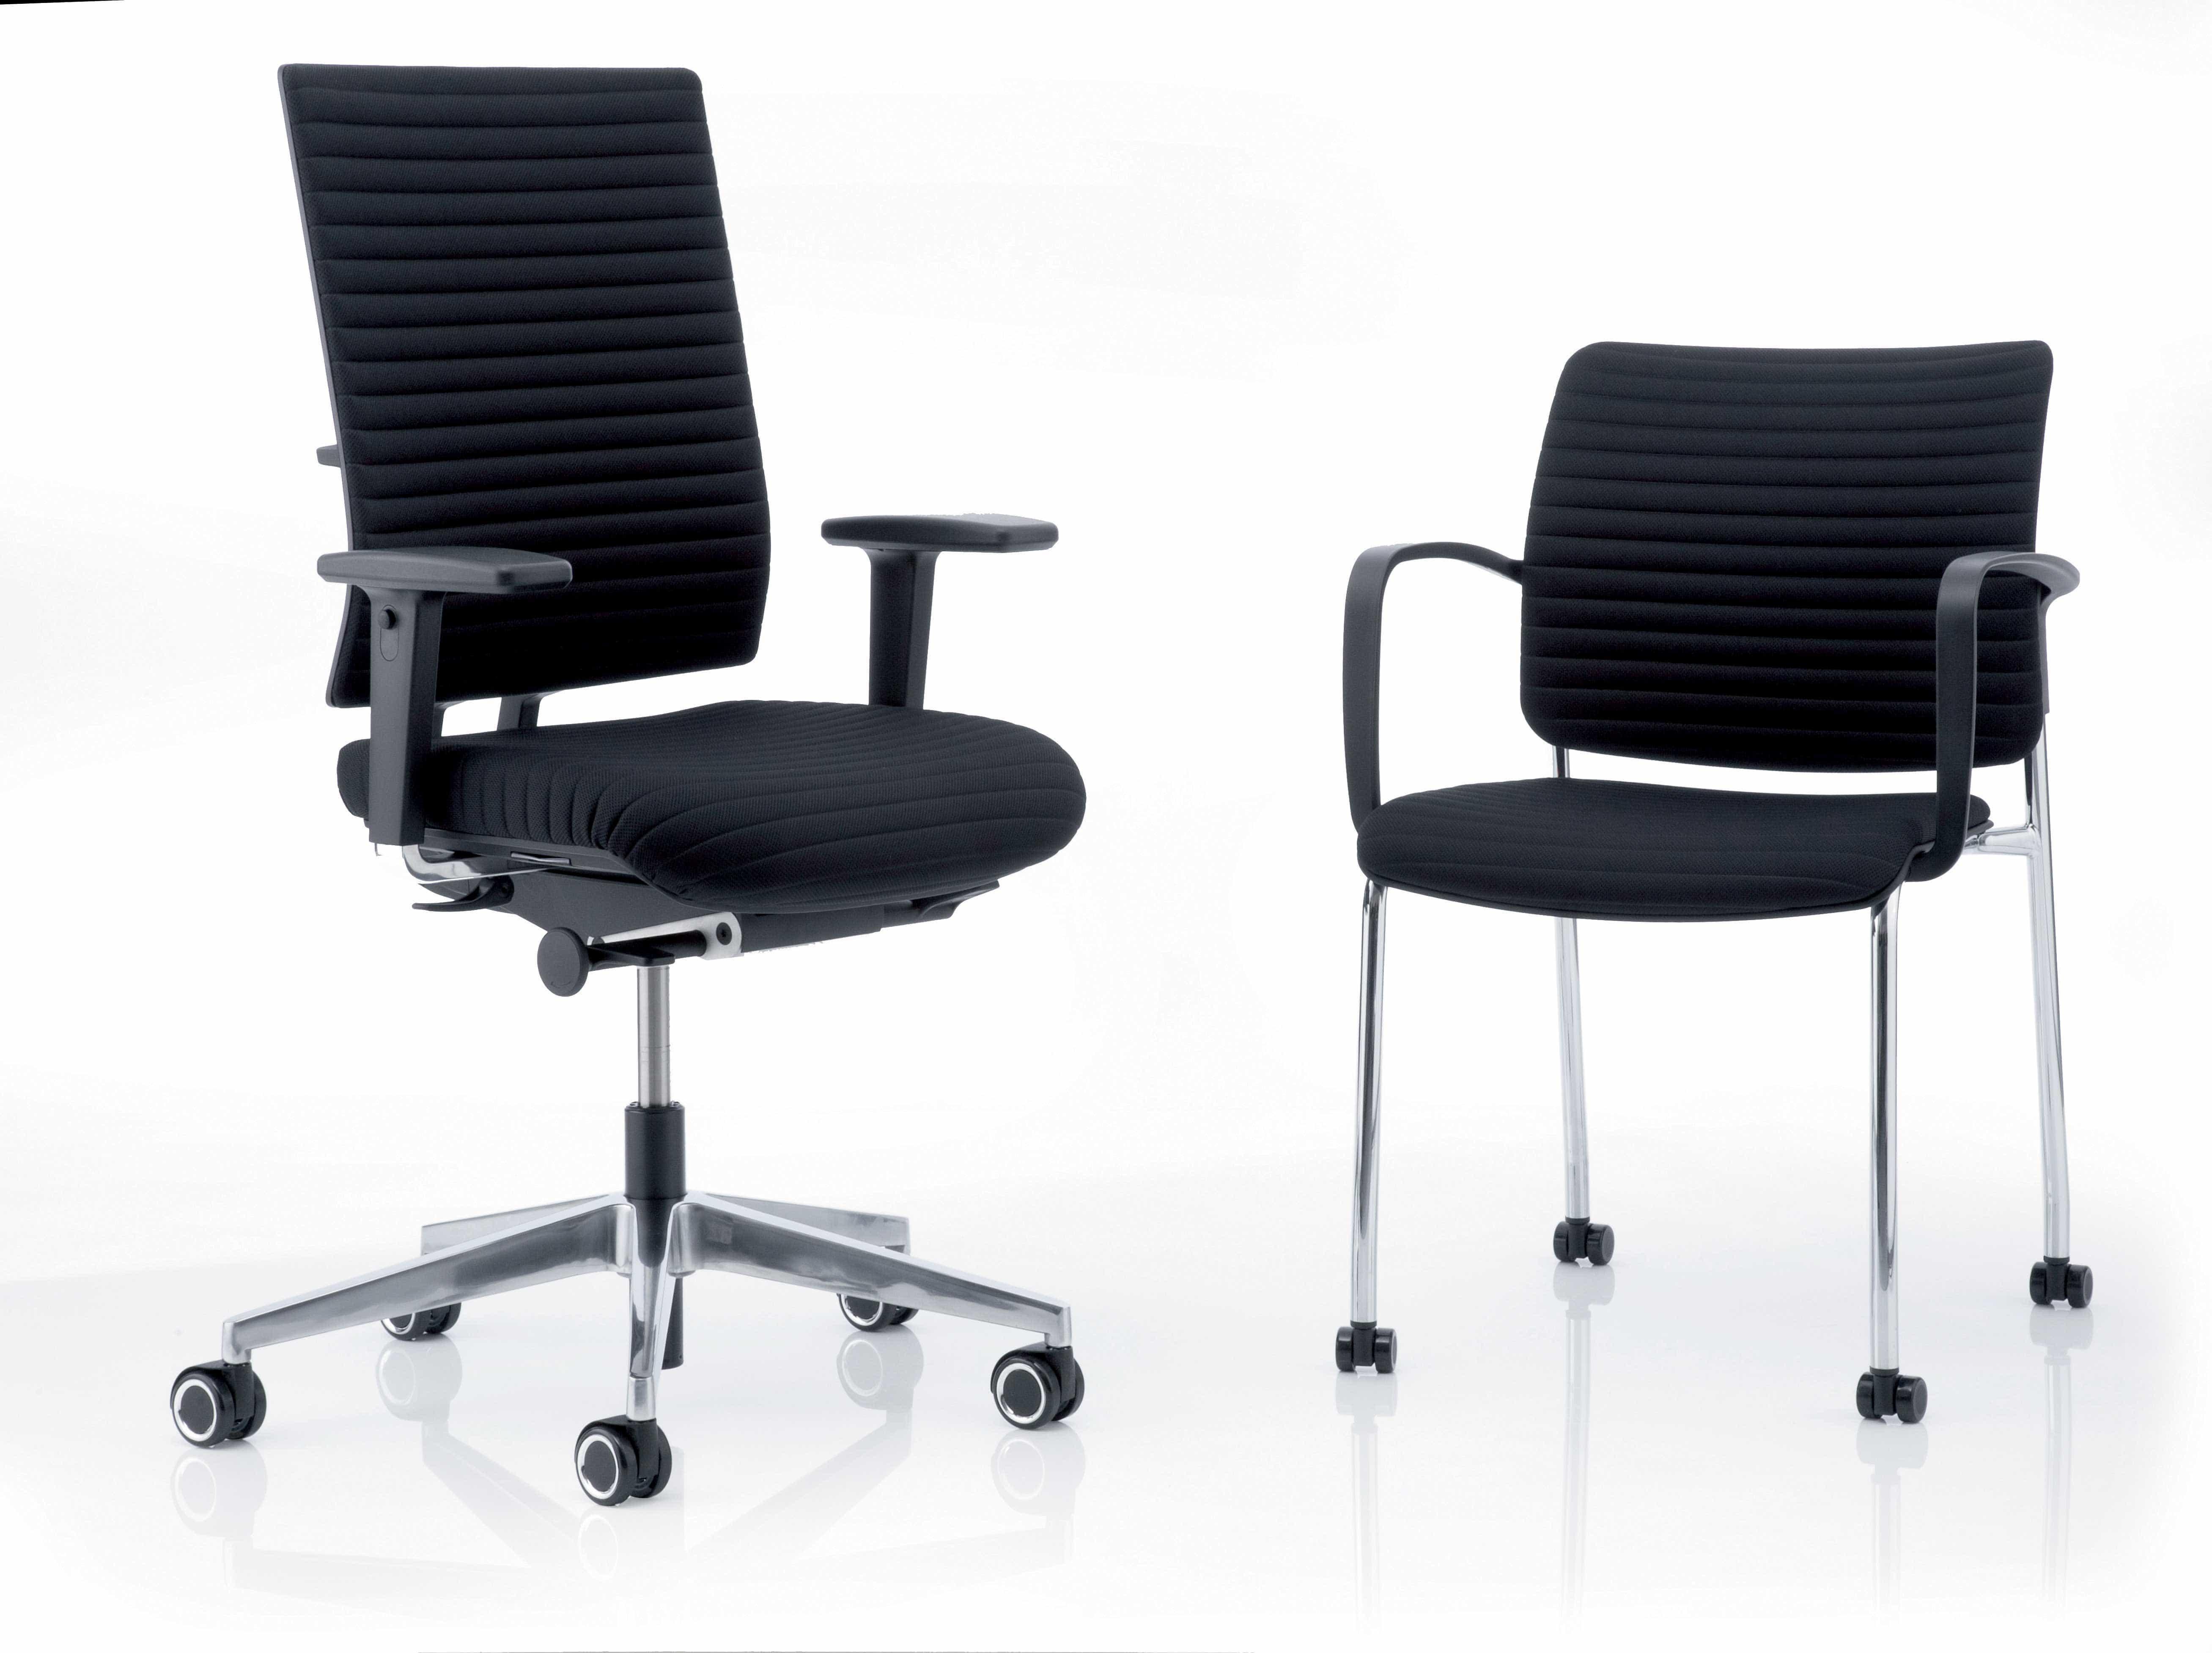 Anteo bureaustoel de jong kantoormeubilair